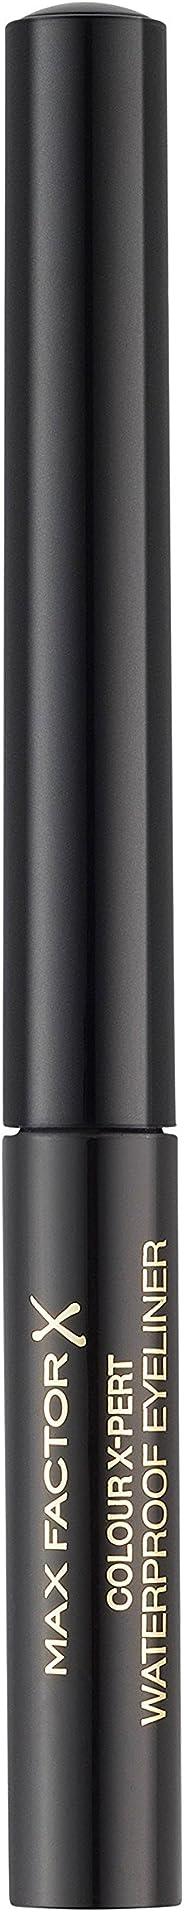 Max Factor Colour Expert Eyeliner, 01 Deep Black, 1.7ml